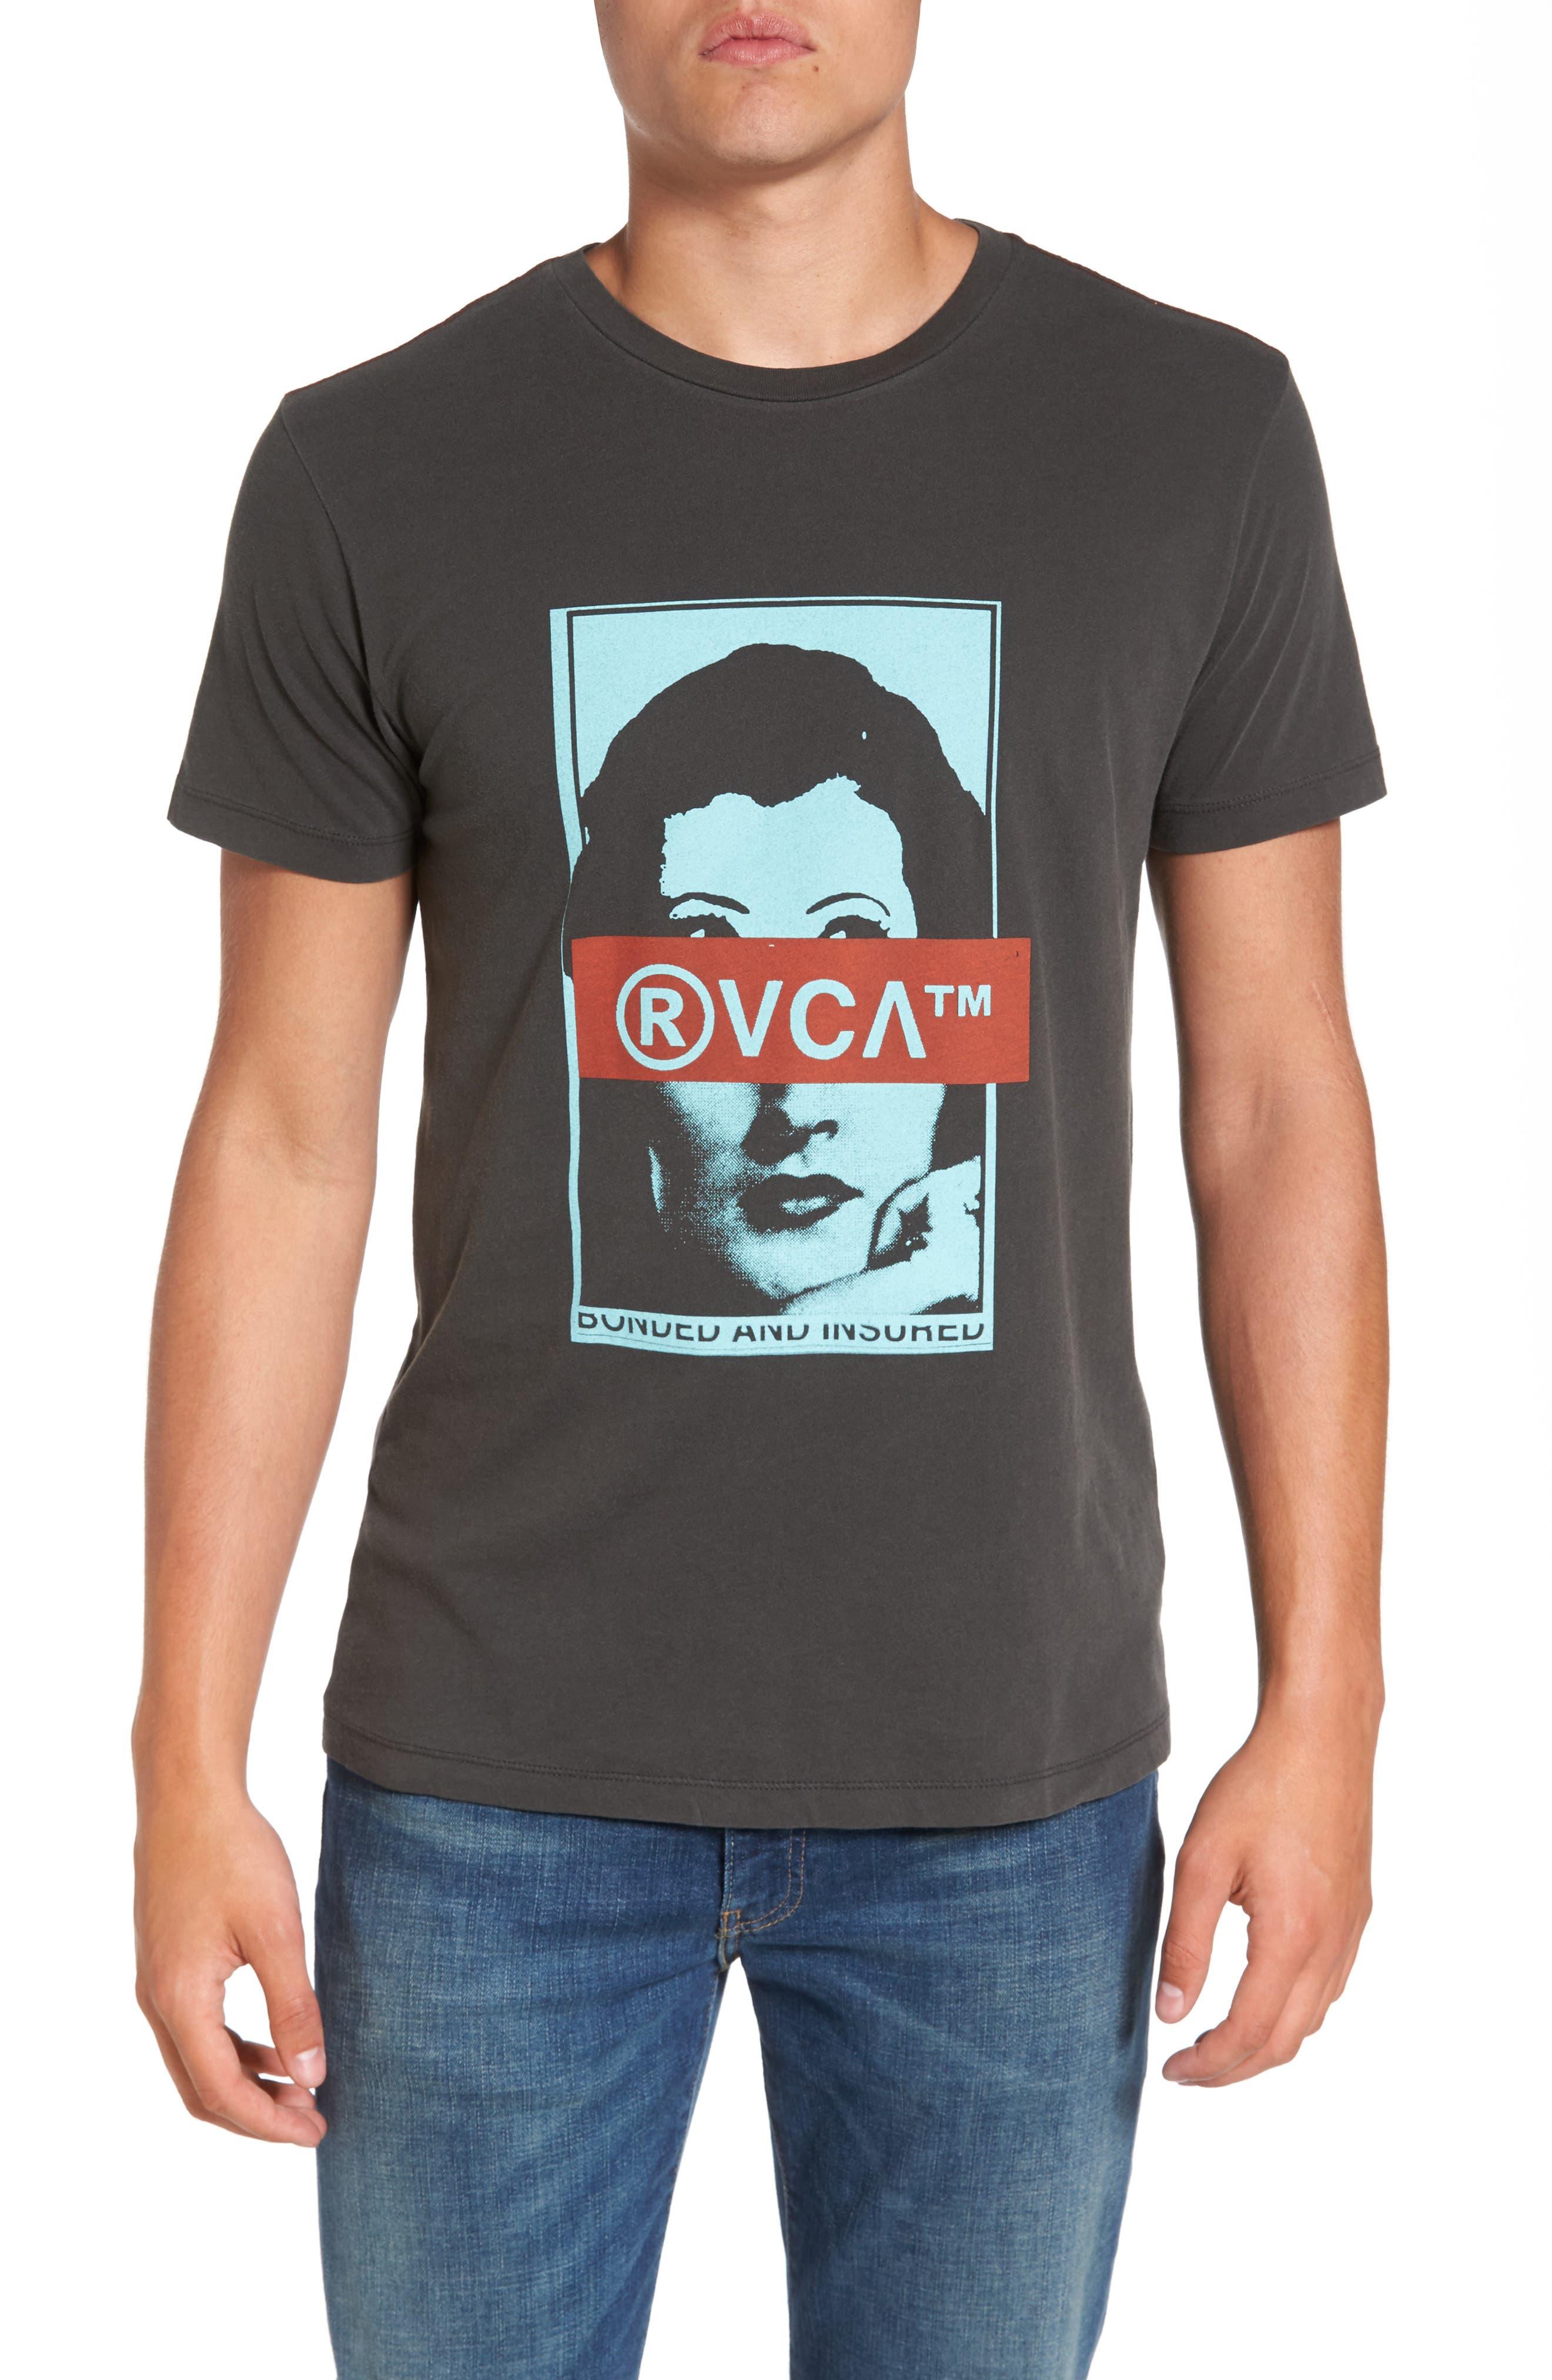 RVCA Split Frames Graphic T-Shirt